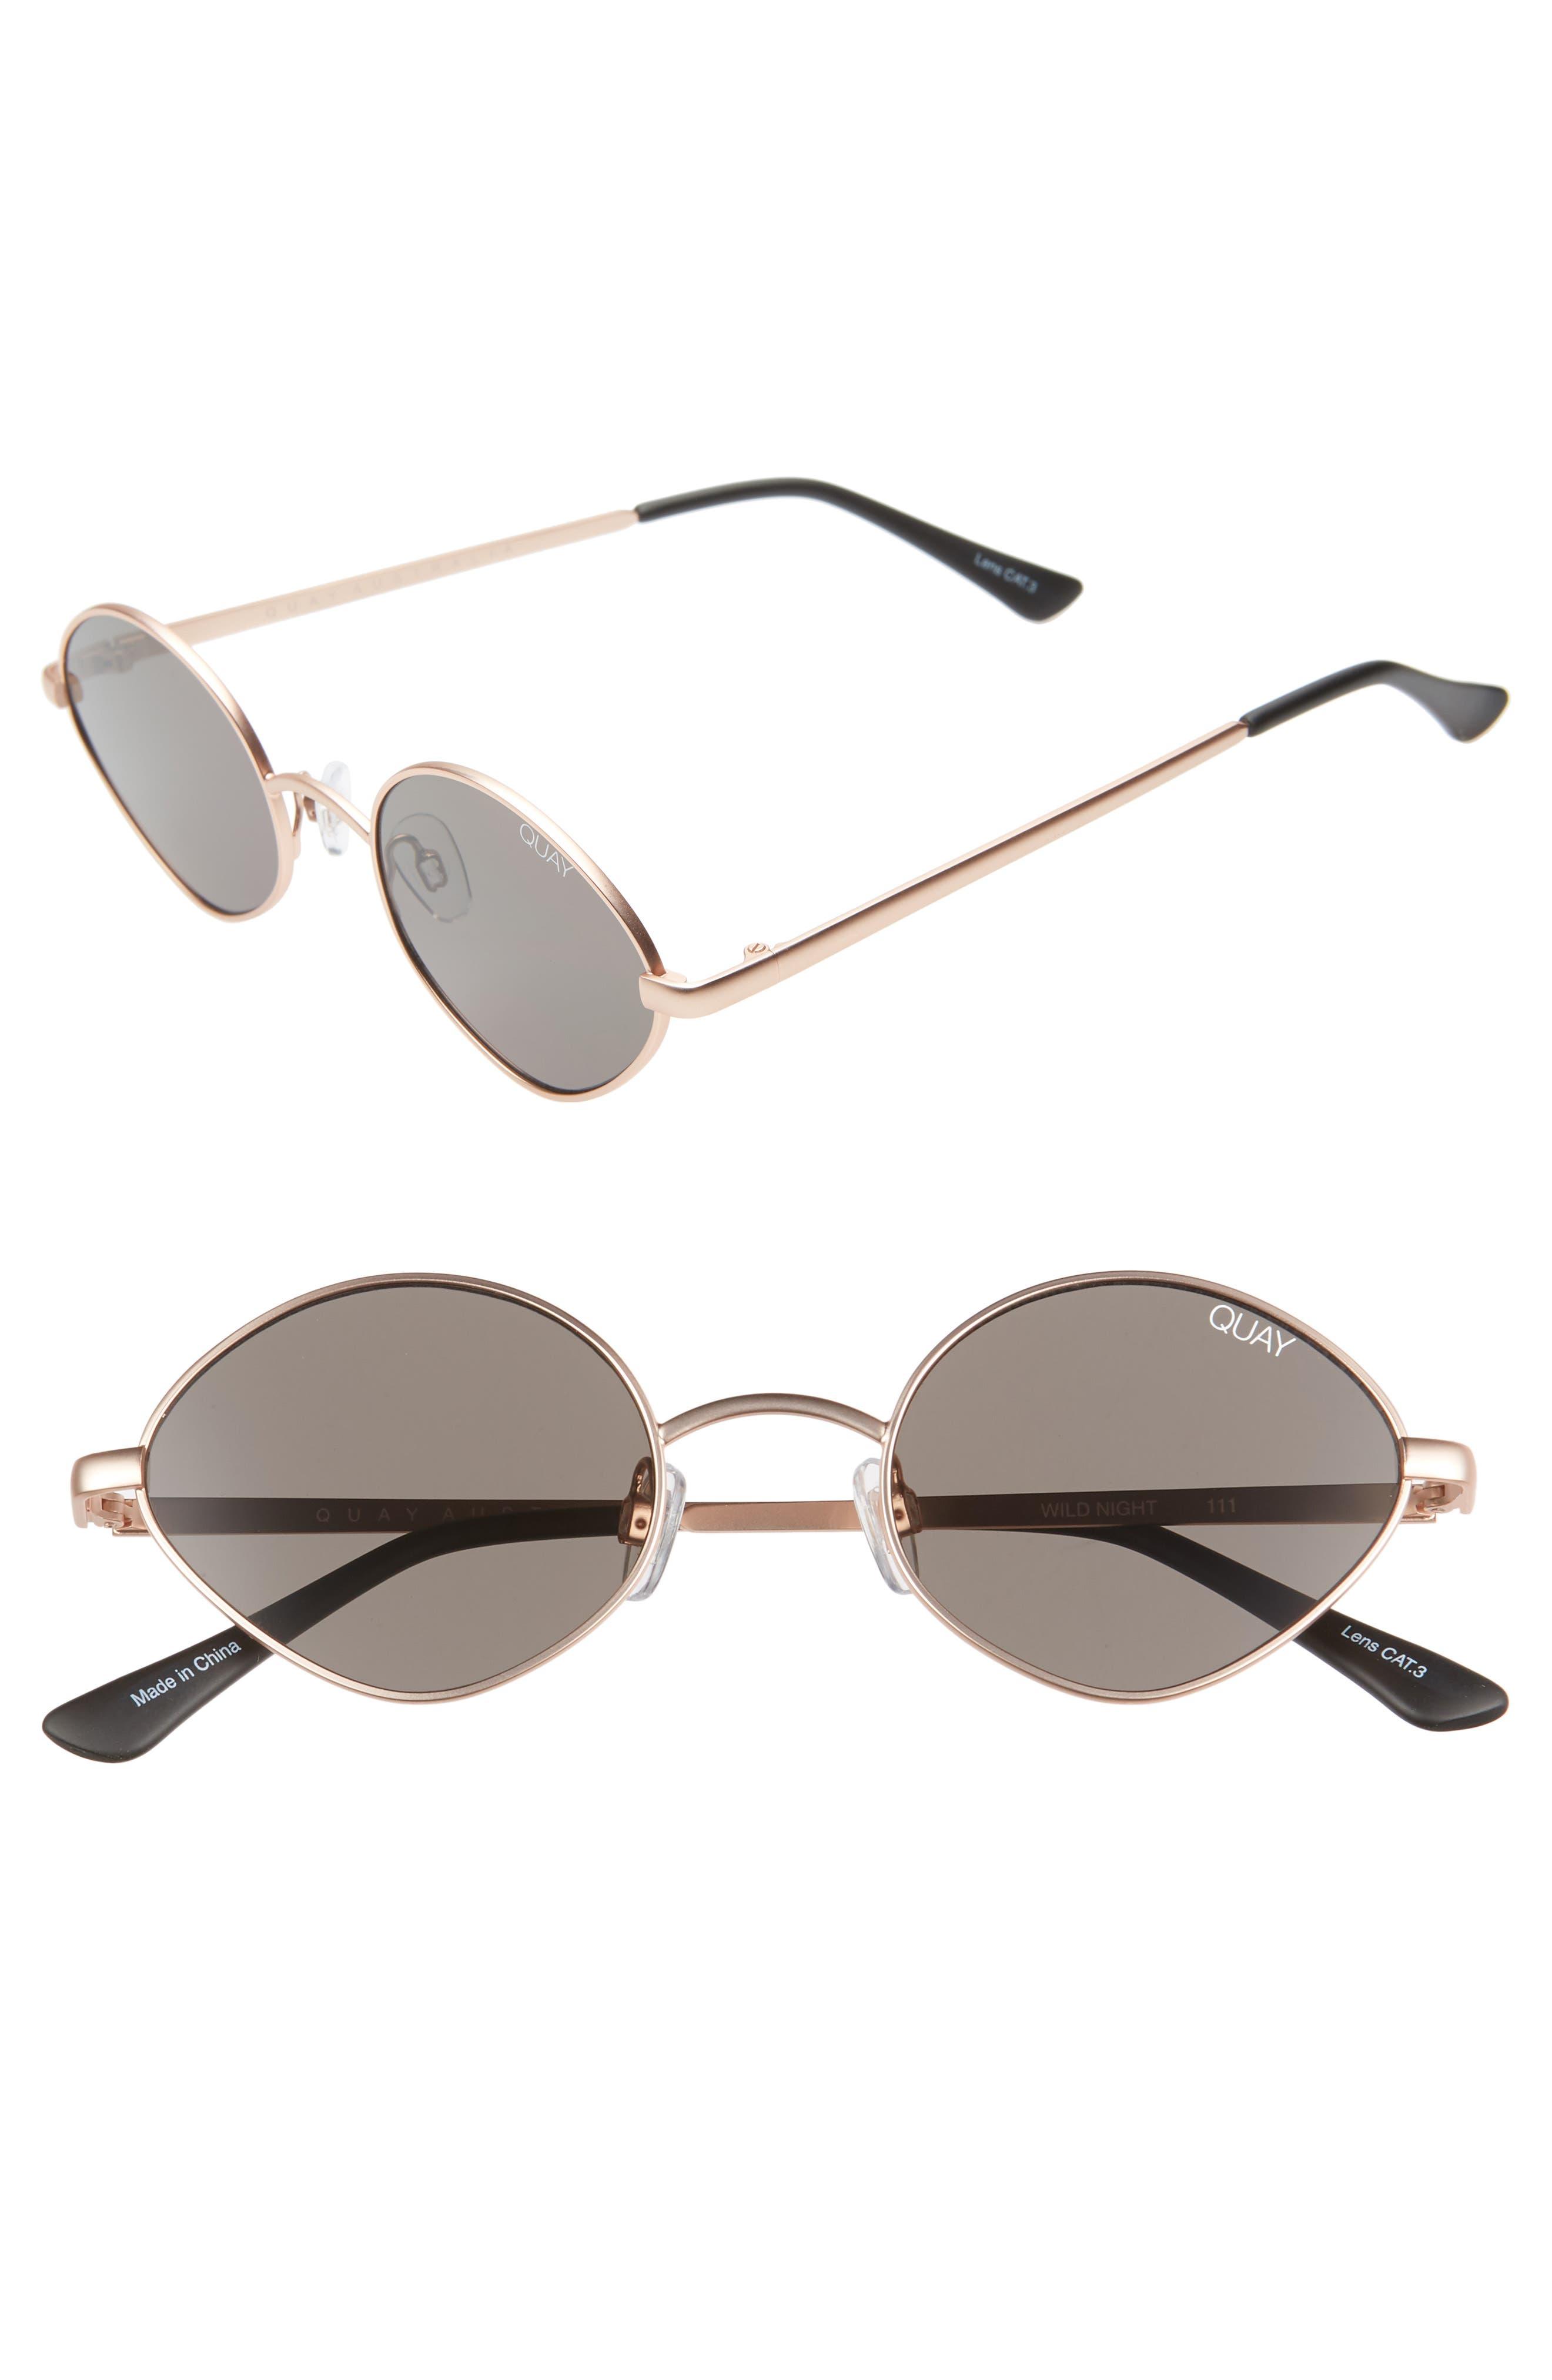 48f1608b69e92 Quay Australia Wild Night 55Mm Teardrop Sunglasses - Rose Gold  Smoke